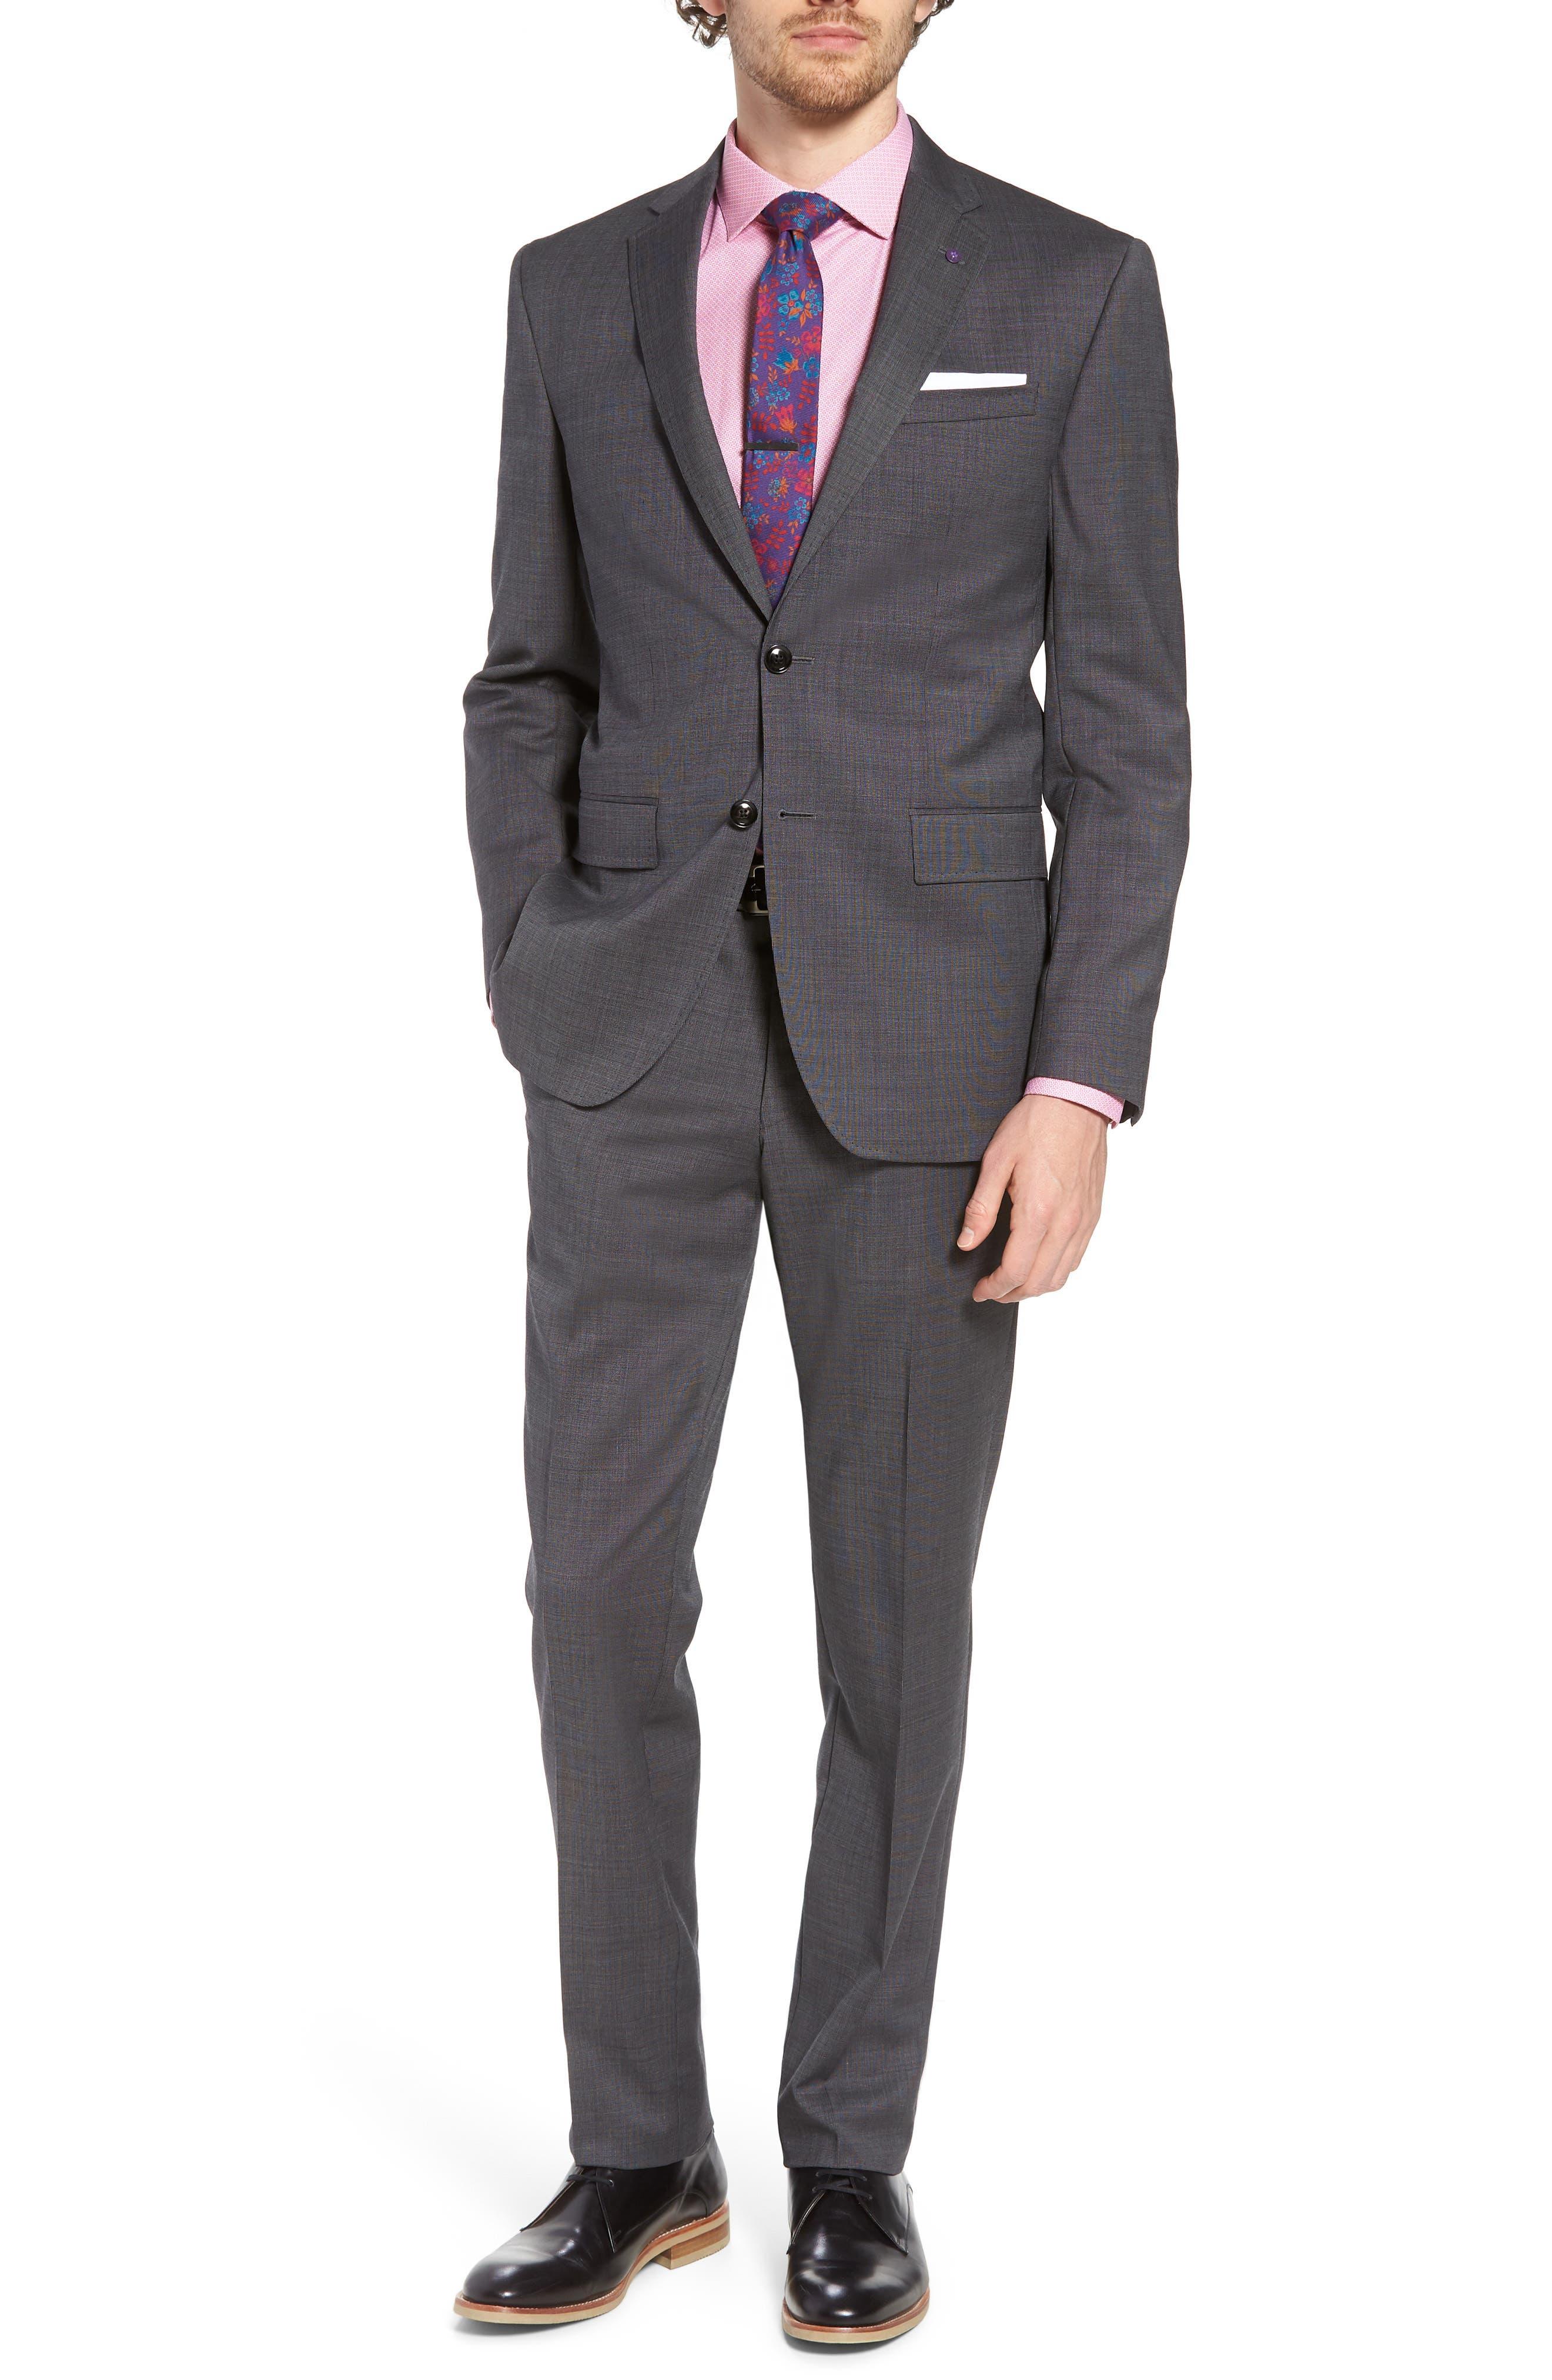 Jay Trim Fit Solid Wool Suit,                         Main,                         color, 020